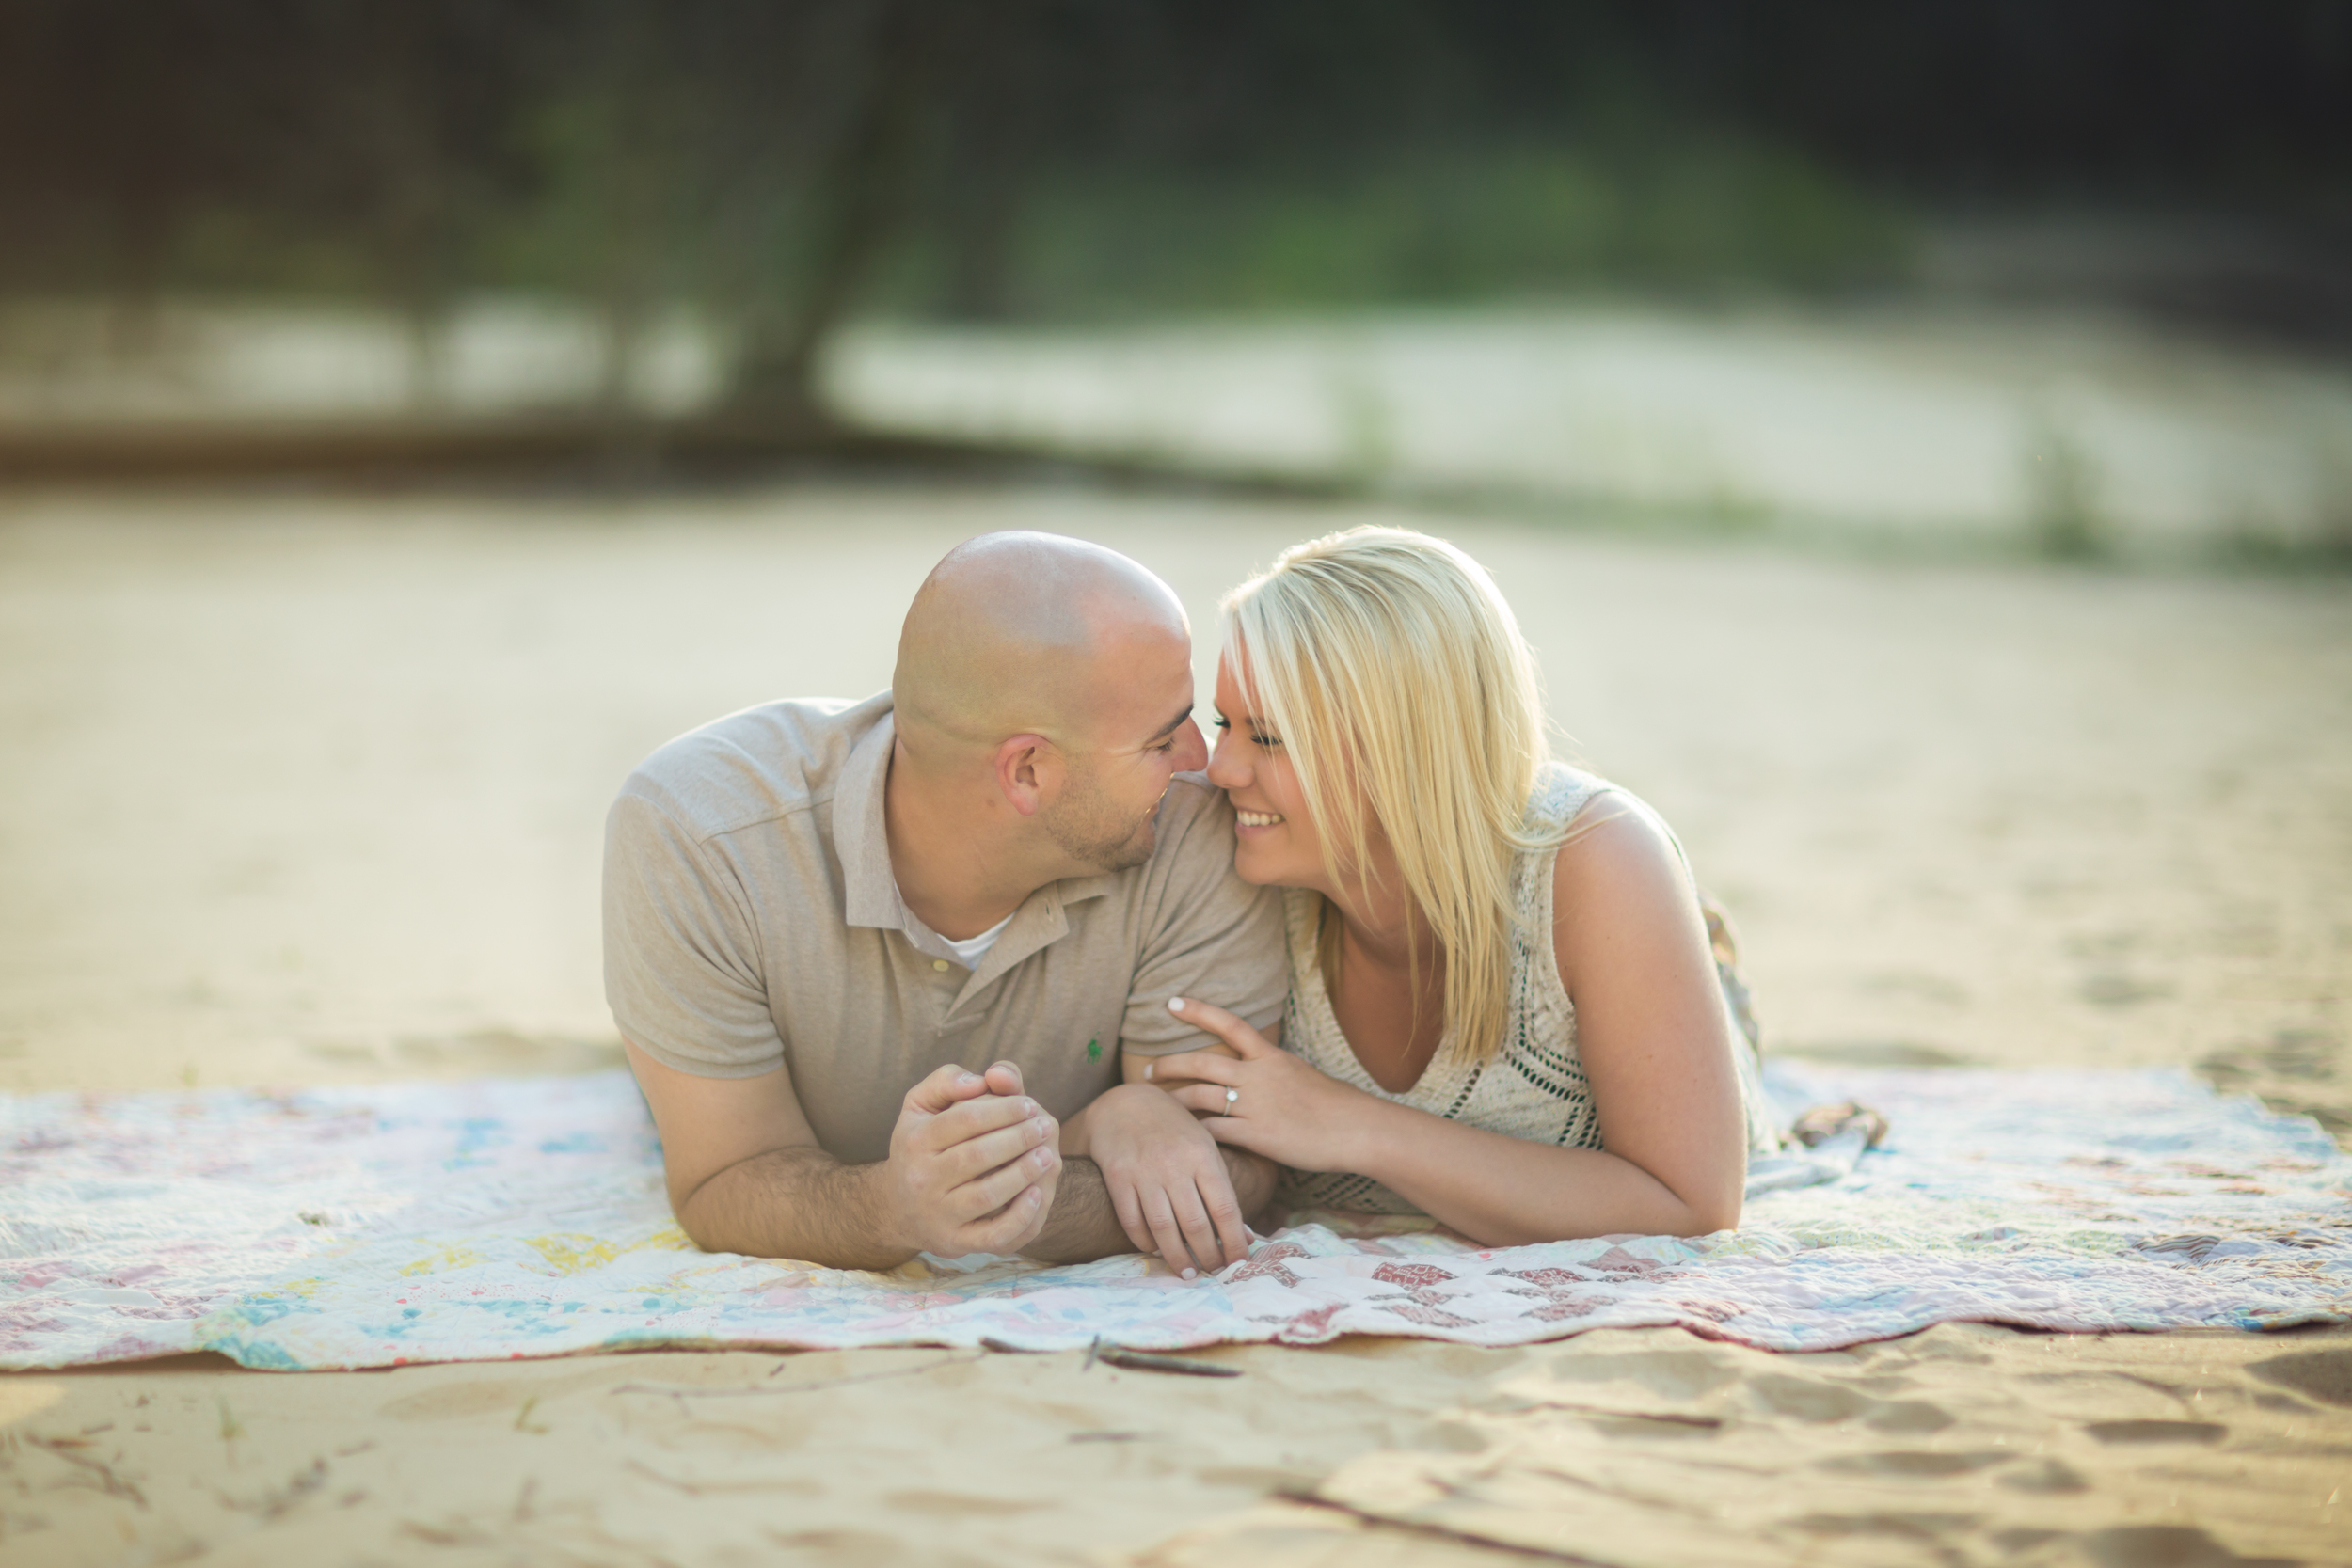 084_Kyle+Shauna_Engagement.jpg